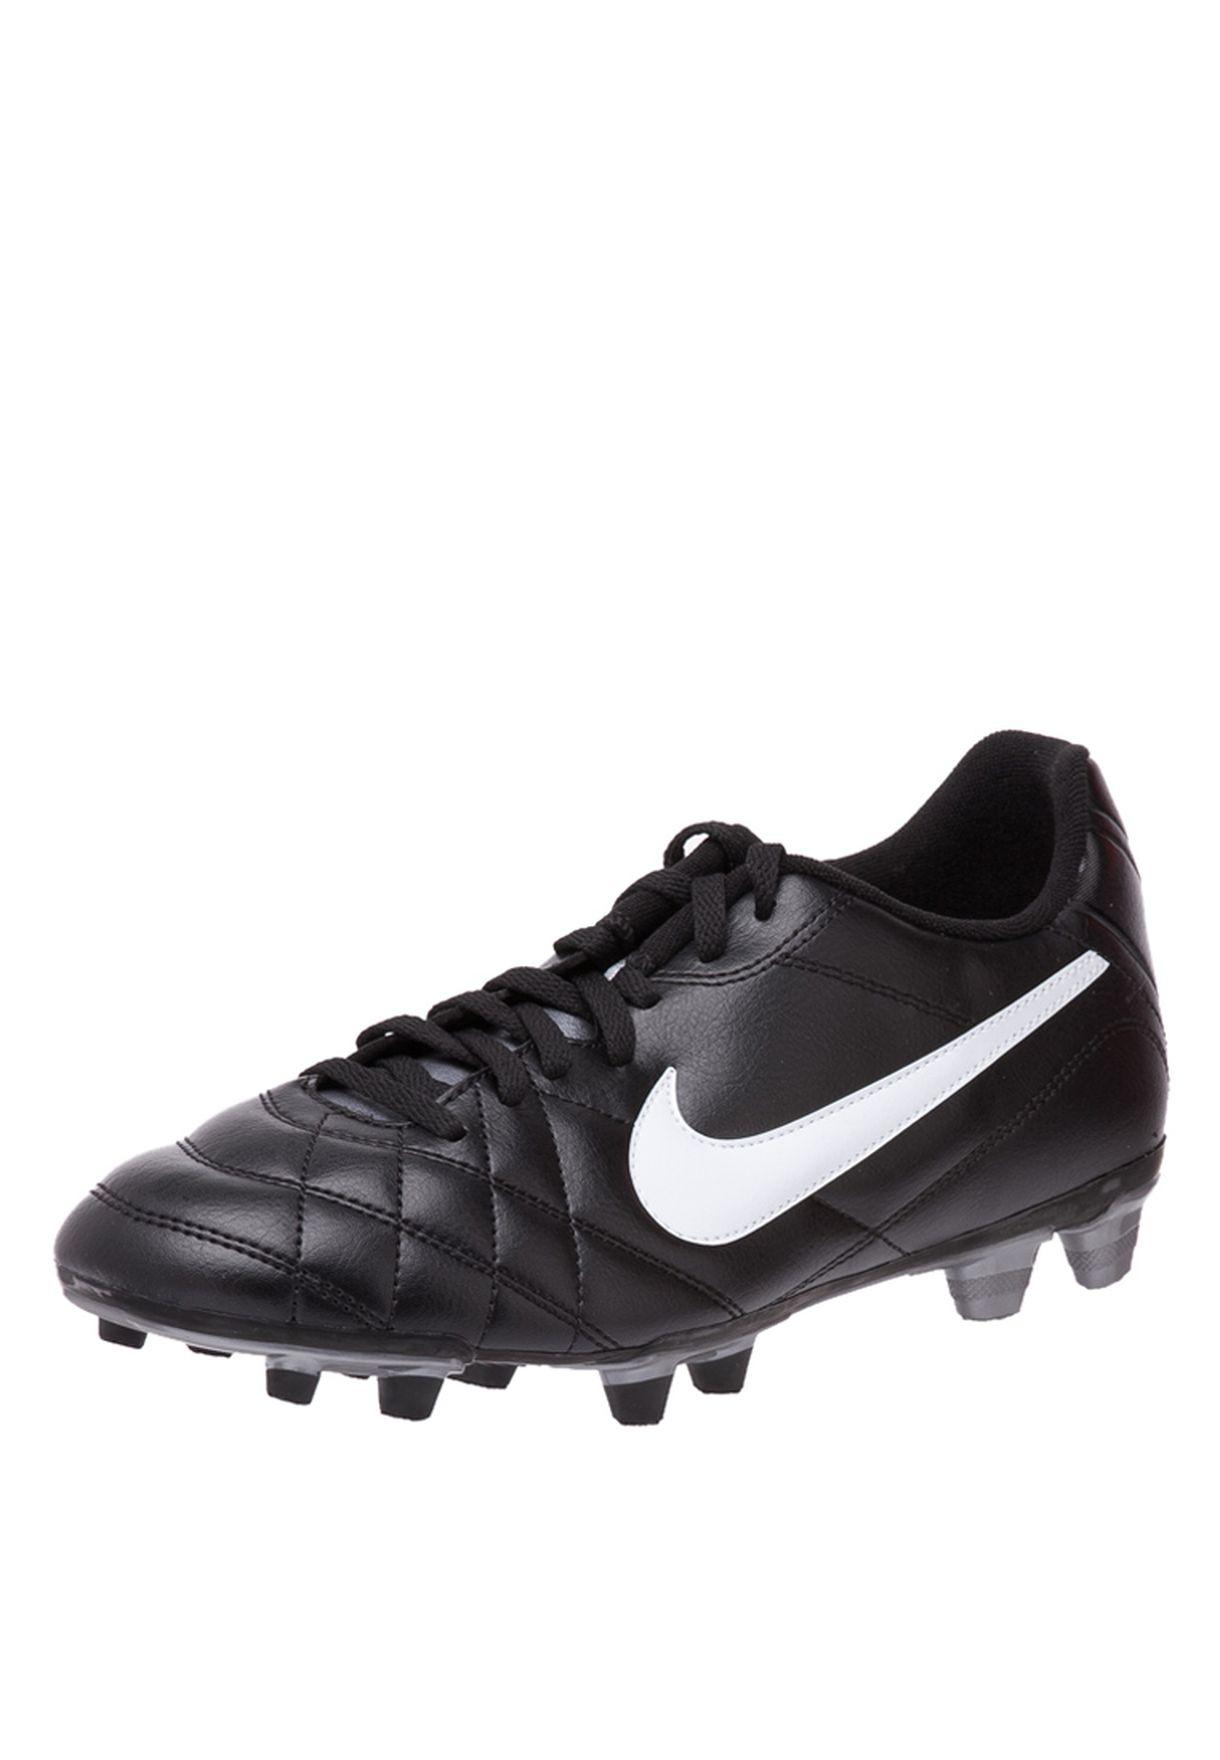 359338b6f55 Shop Nike black Tiempo Rio FG Football 509038-010 for Men in UAE ...